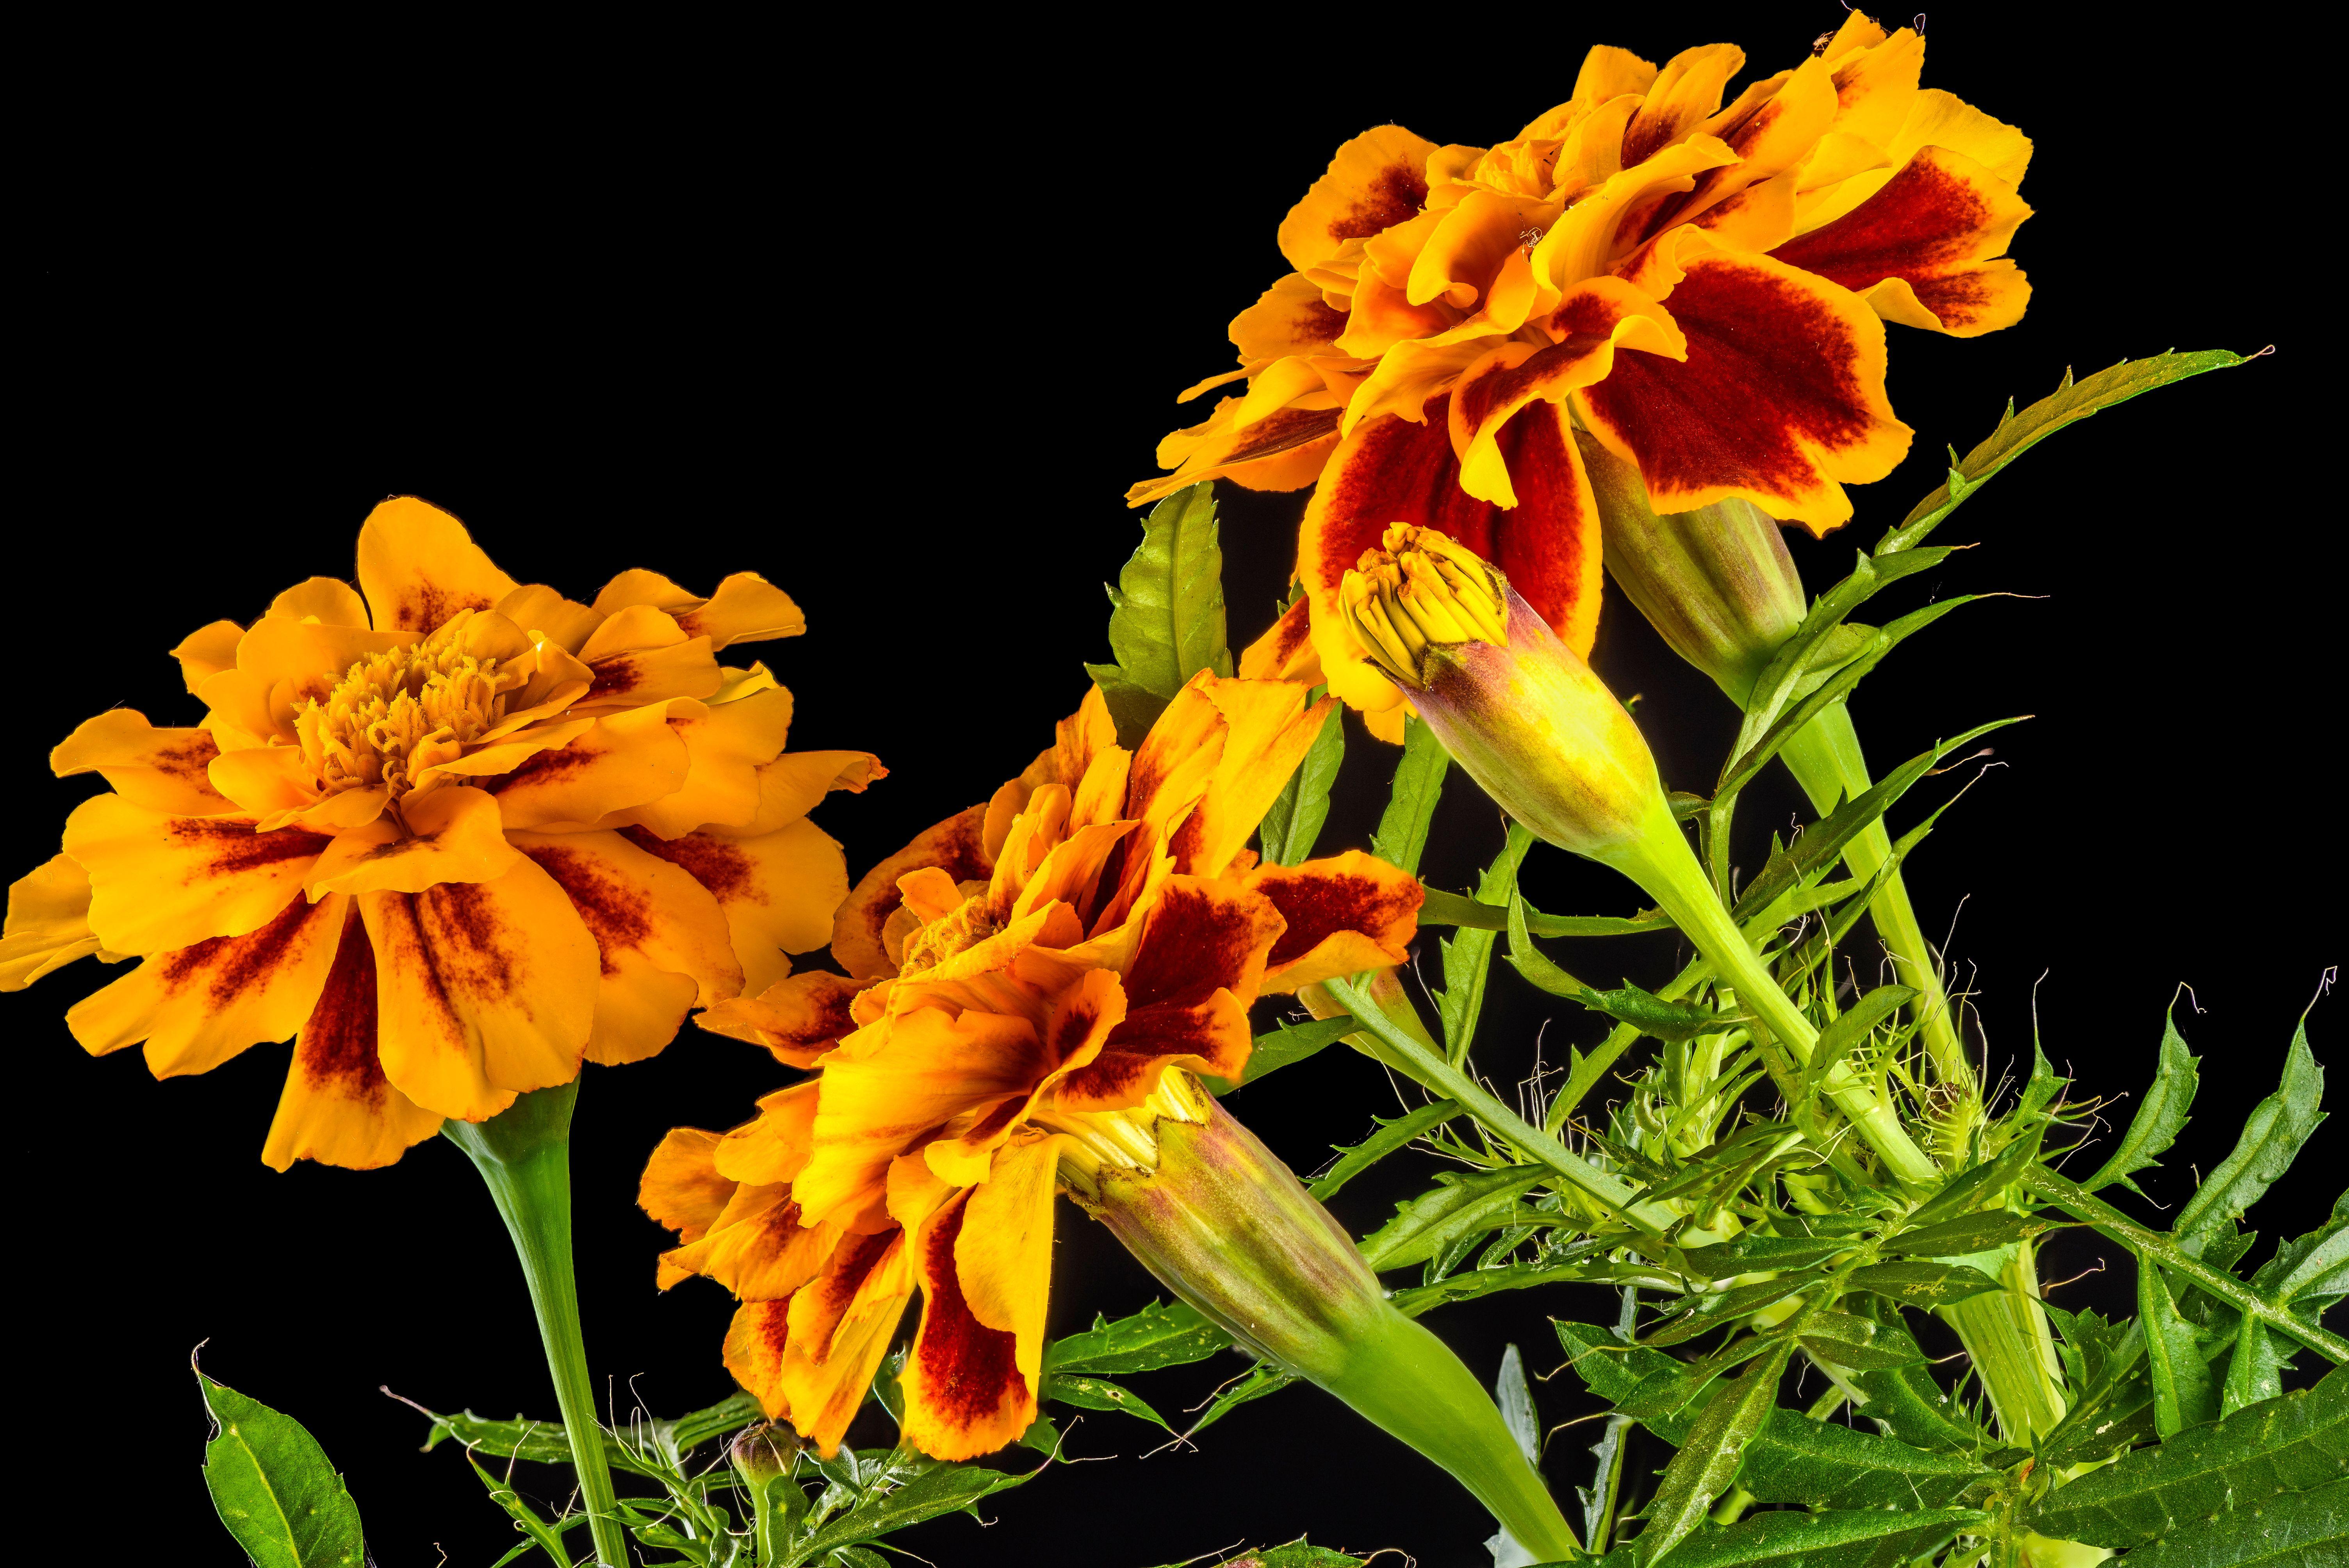 Обои Бархотки, Бархатцы, цветы, чёрный фон